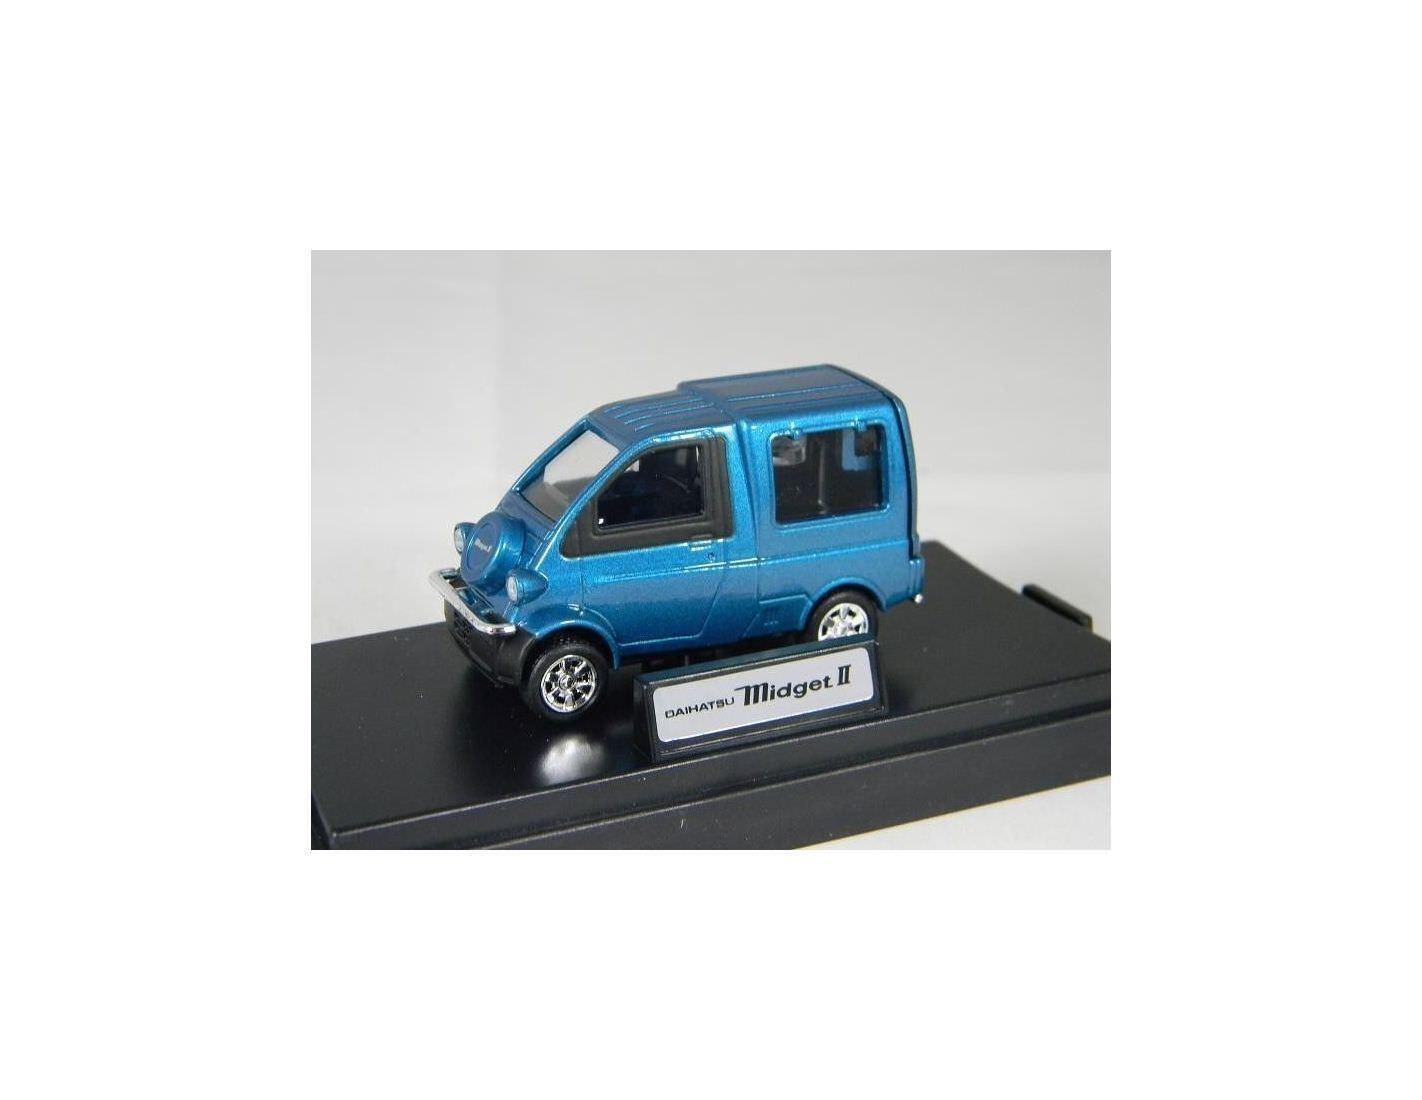 Epoch Co.ltd Co.ltd Co.ltd 870821 DAIHATSU MIDGET II LIGHT azul 1 43 Modellino ae8217